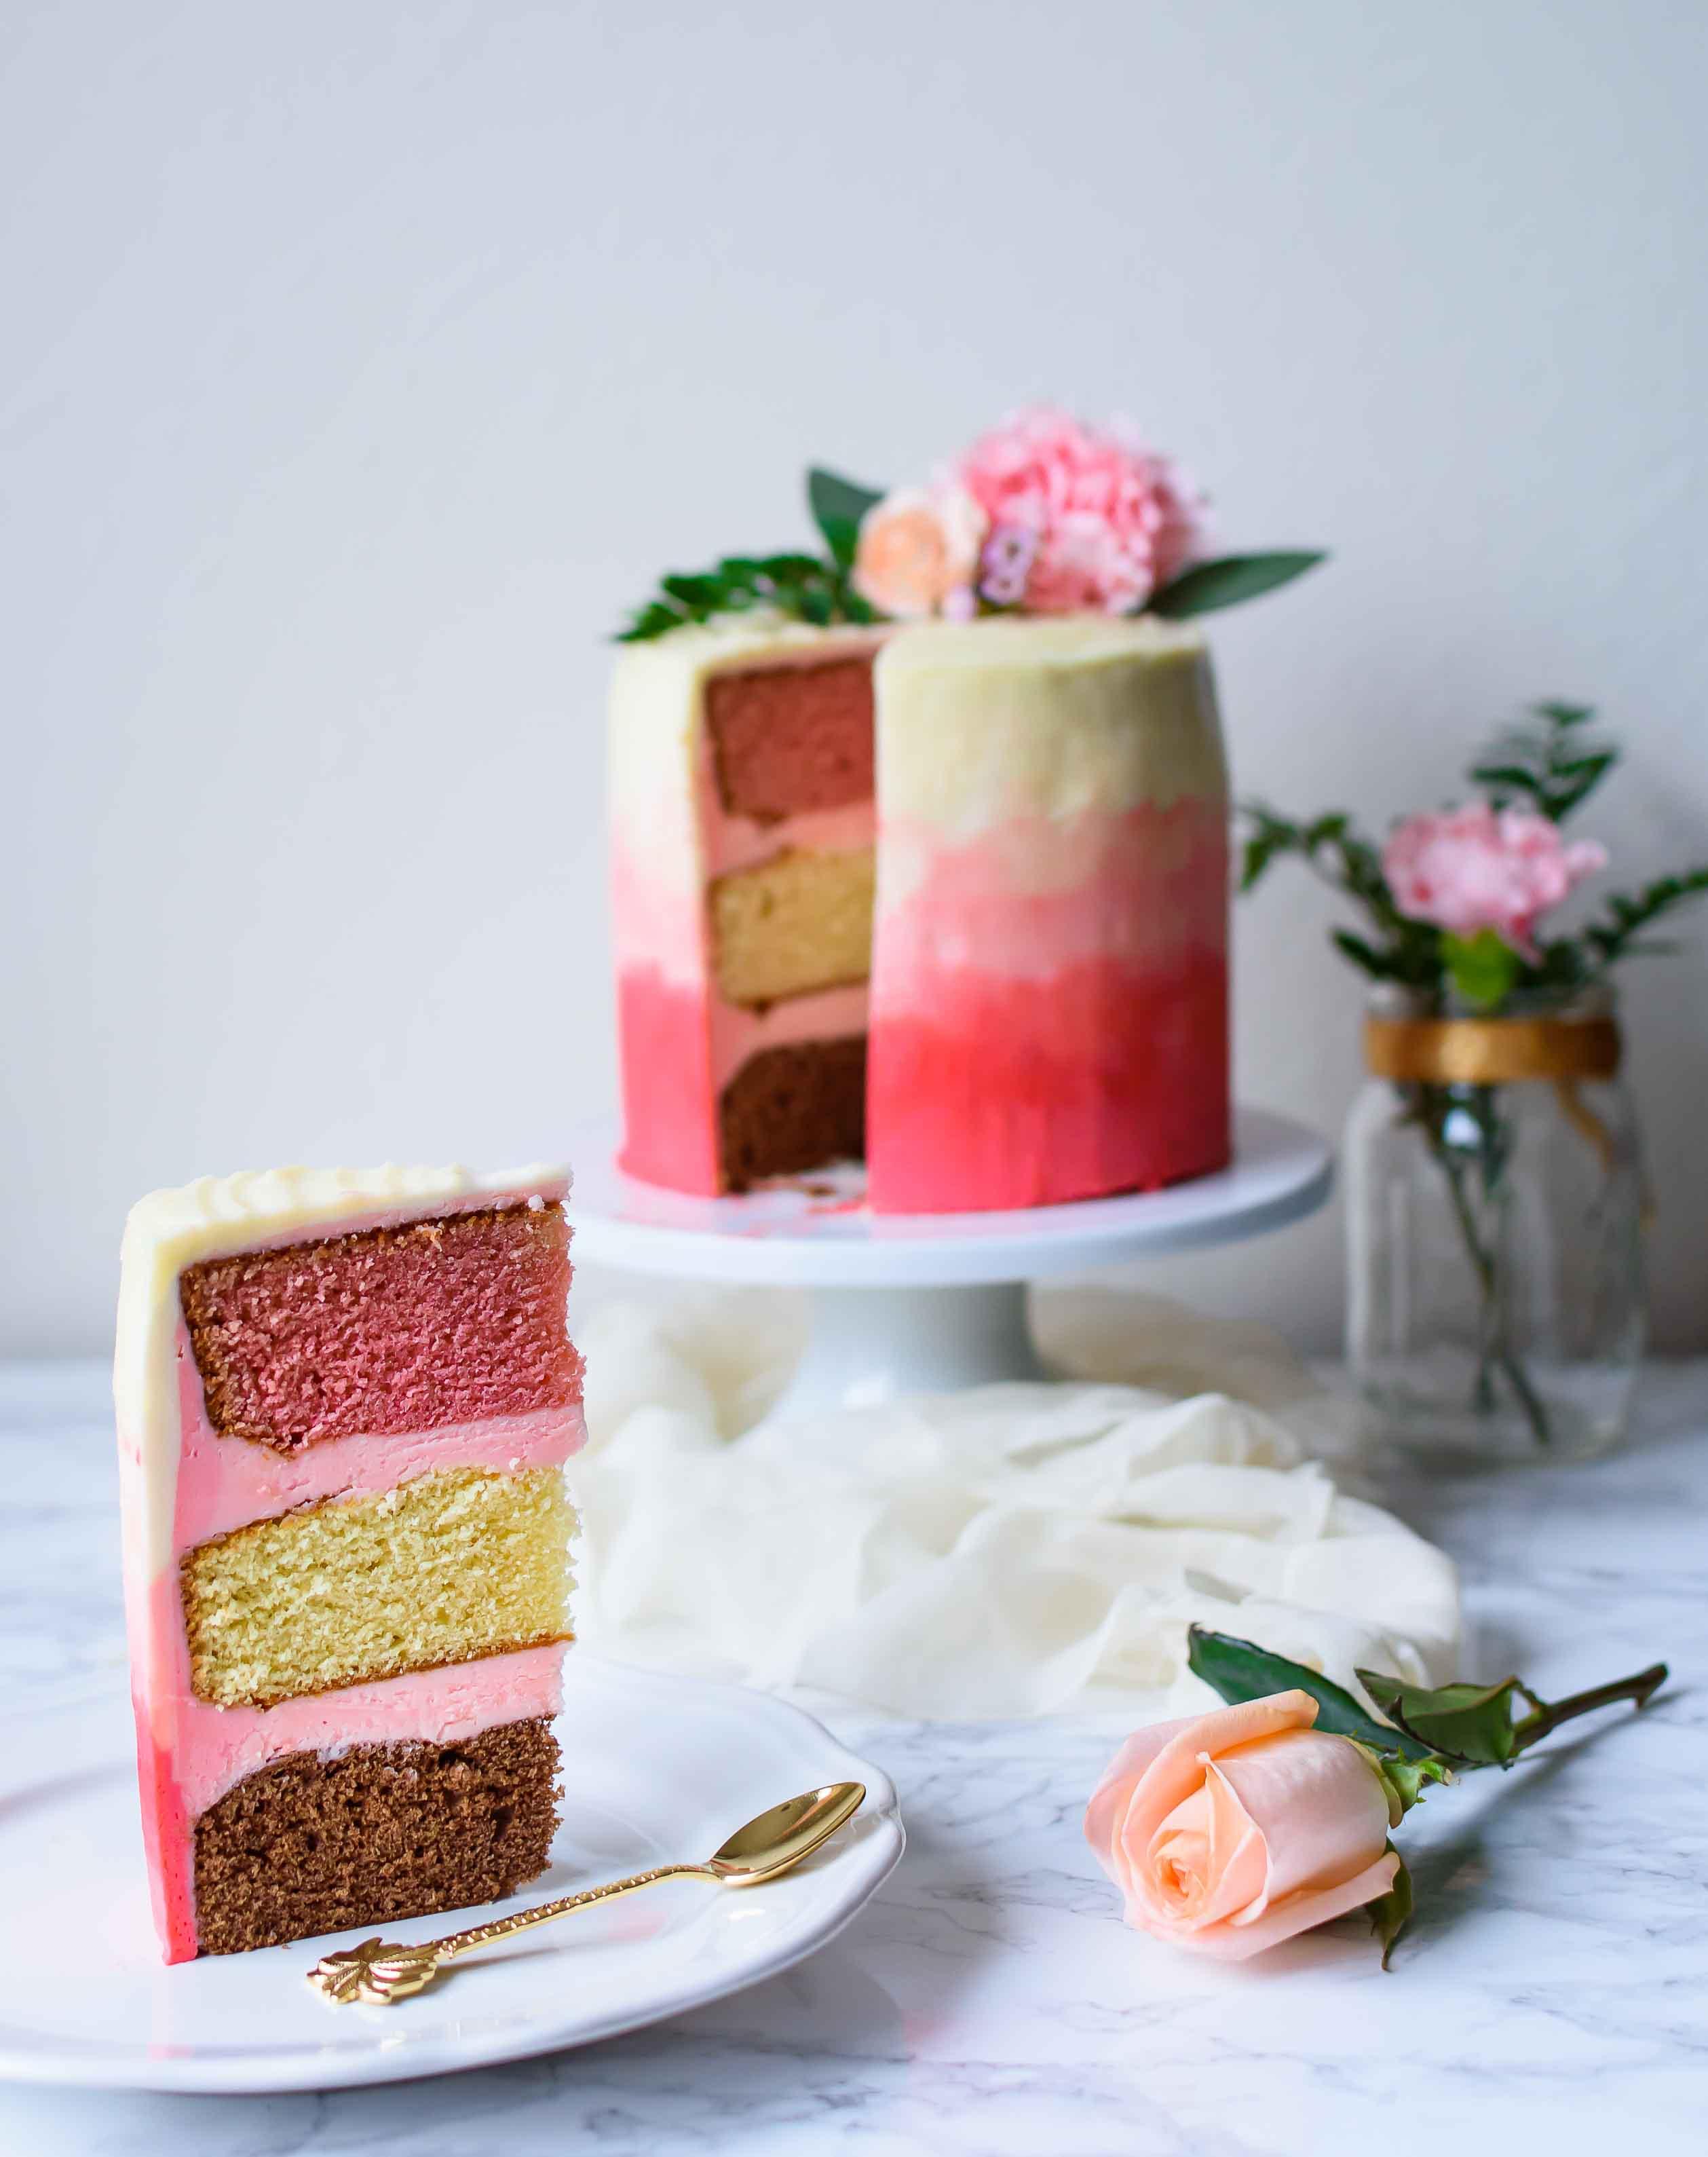 Neapolitan Cake- Pepper Delight #pepperdelightblog #recipe #neapolitancake #neopolitan #cake #strawberrycake #bloganniversary #chocolatecake #ombrecake #celebration #onebowlcake #threetiercake